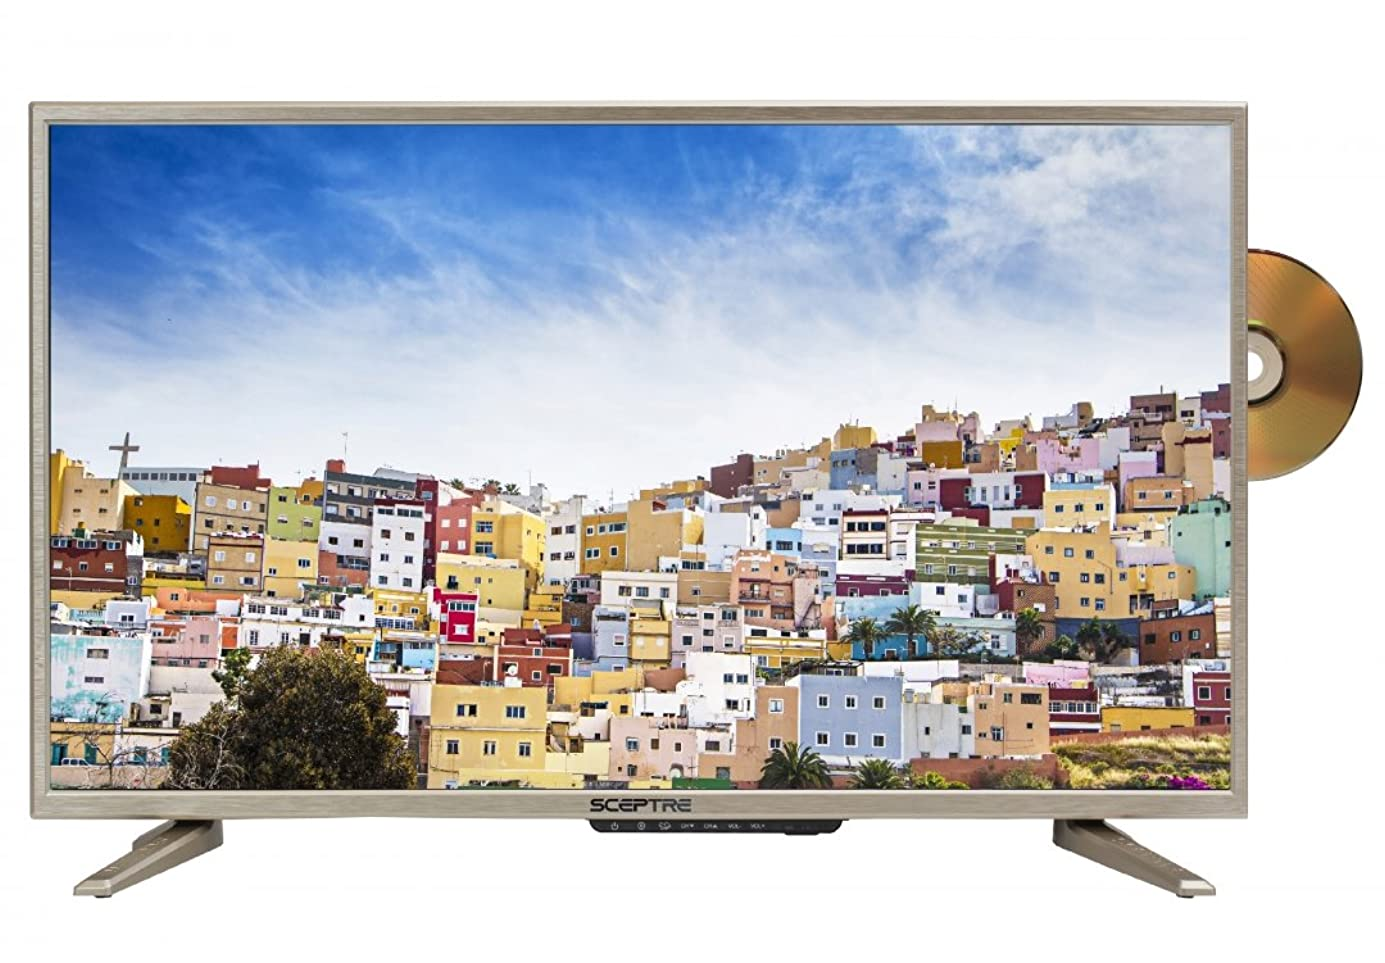 MAX TV Gold 5G PVR IPTV + Android 7 1 64-bit Multi-Core 4K